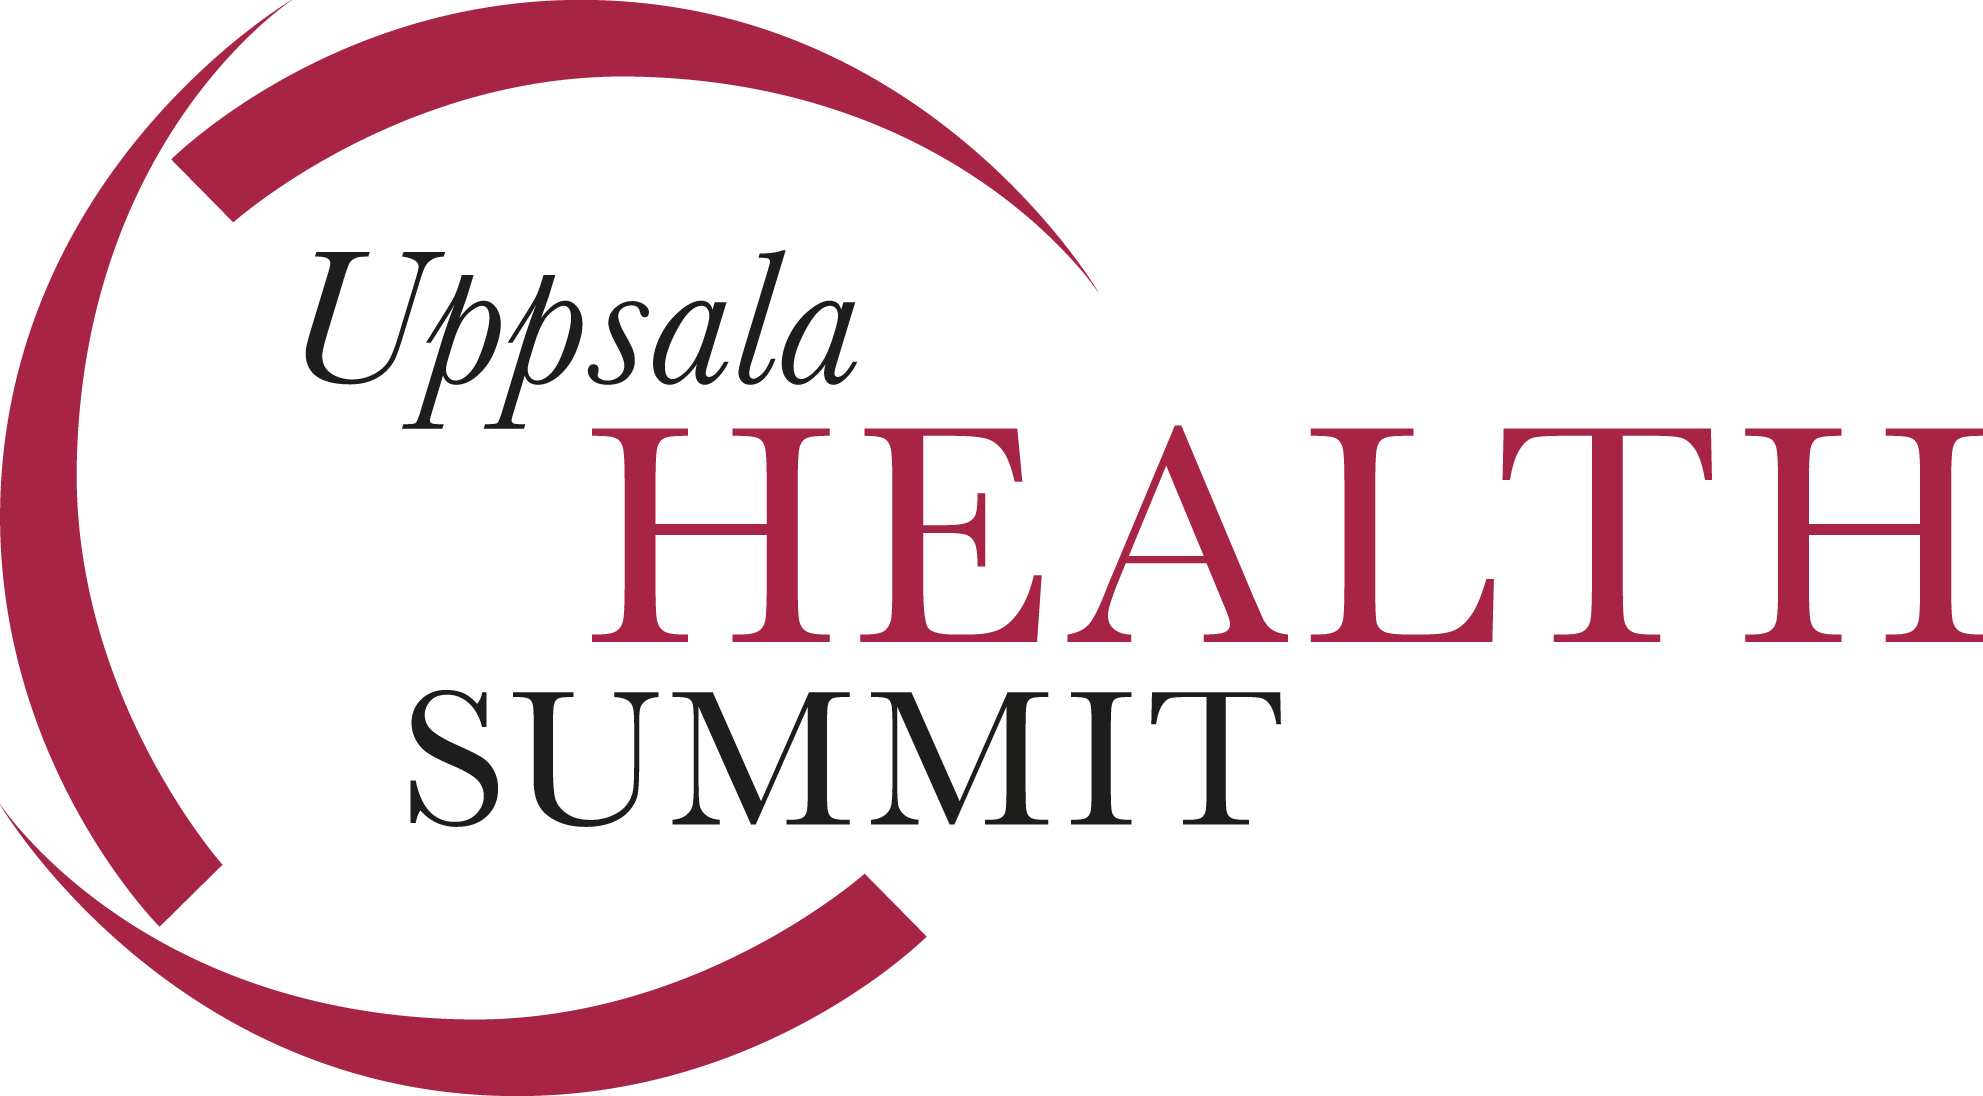 Icon for Uppsala Health Summit